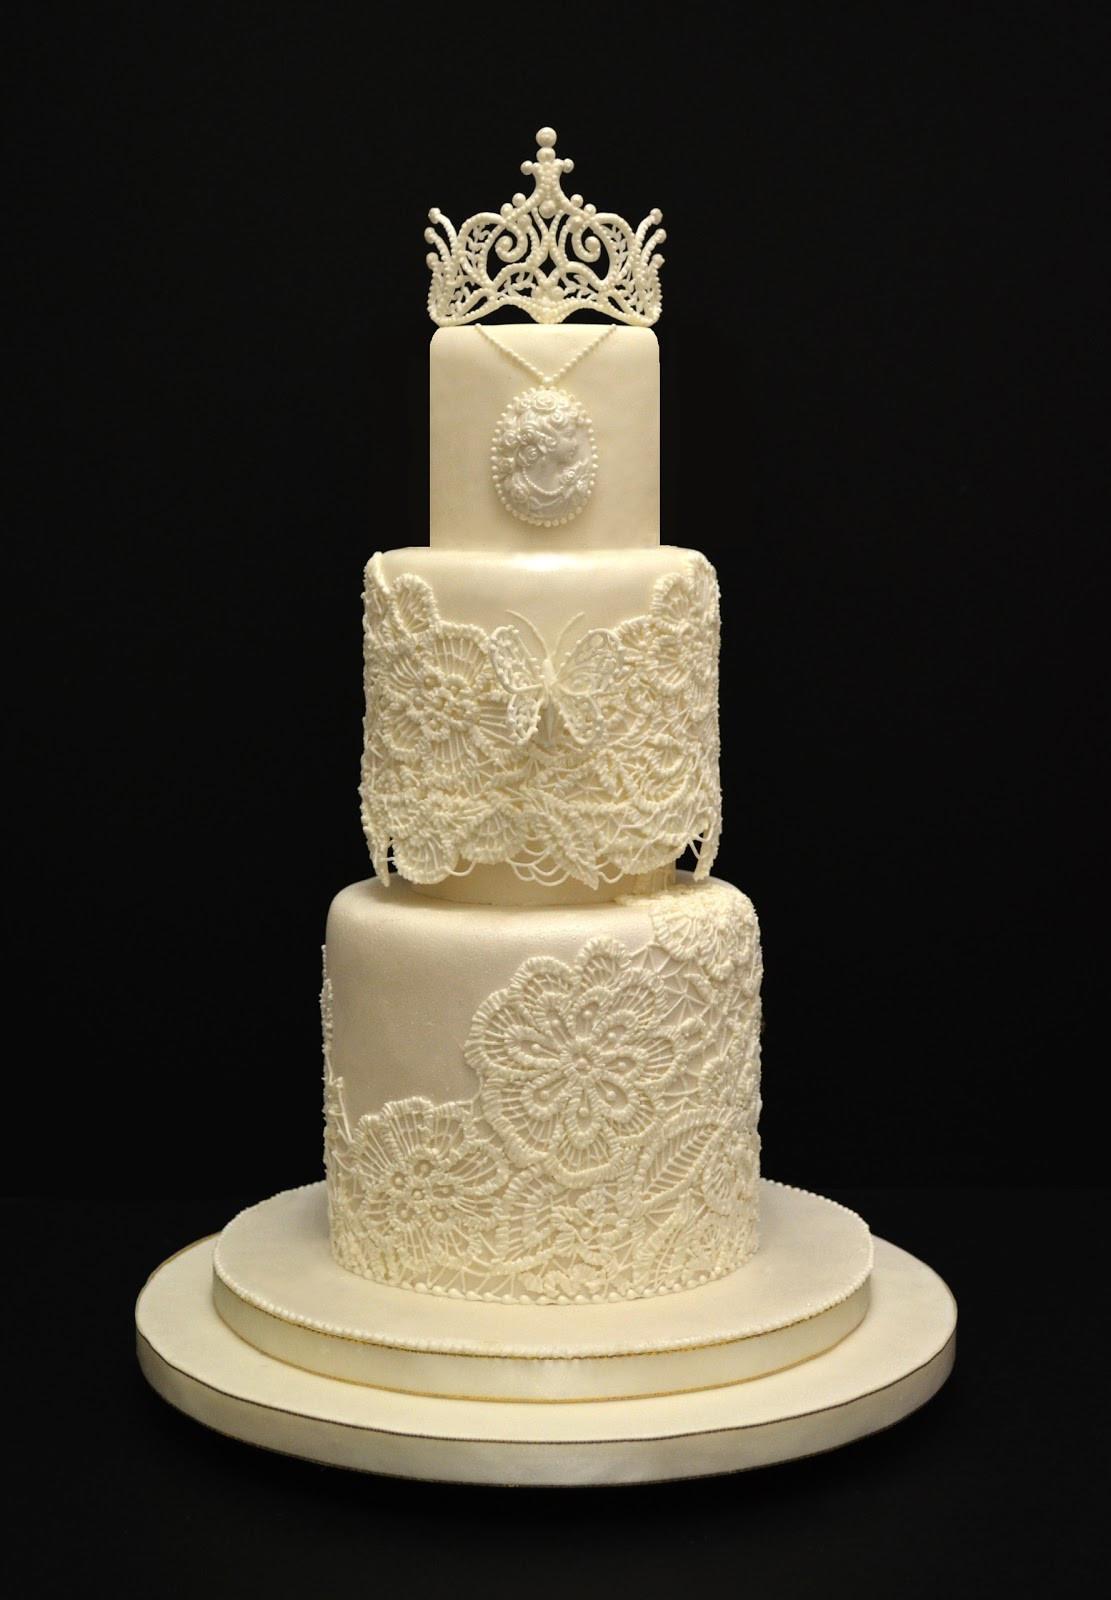 Royal Icing Wedding Cakes  vinism sugar art the bride